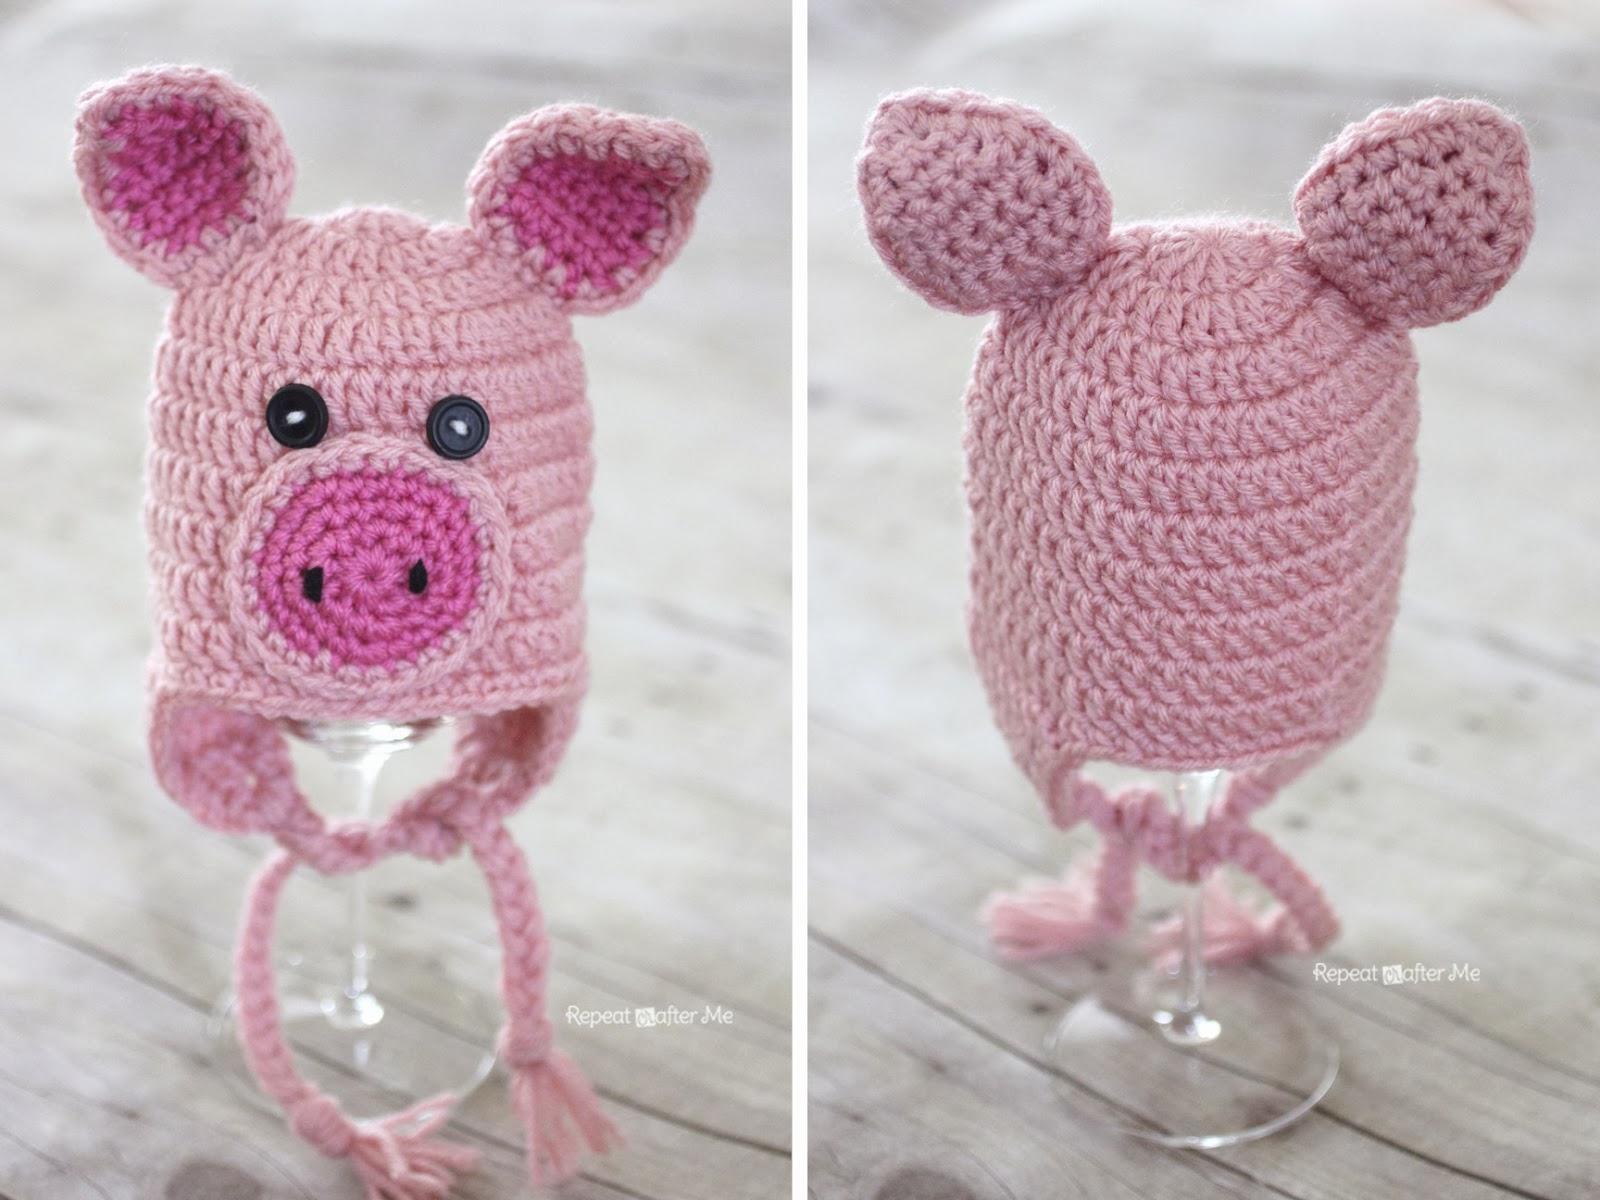 Crochet Pattern Pig Hat : Crochet Pig Hat Pattern Repeat Crafter Me Bloglovin